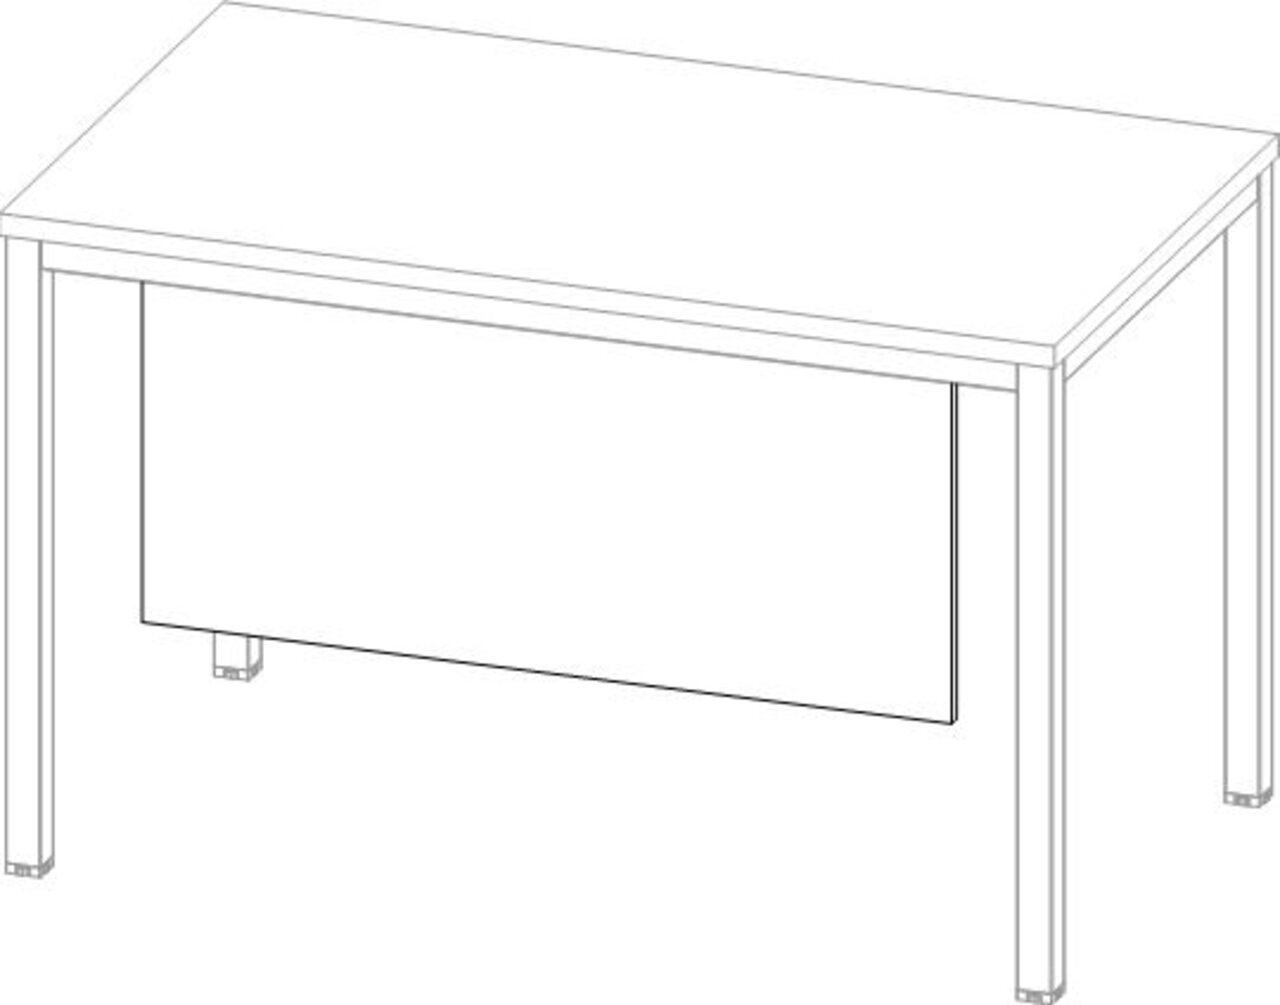 Царга к столу - фото 4